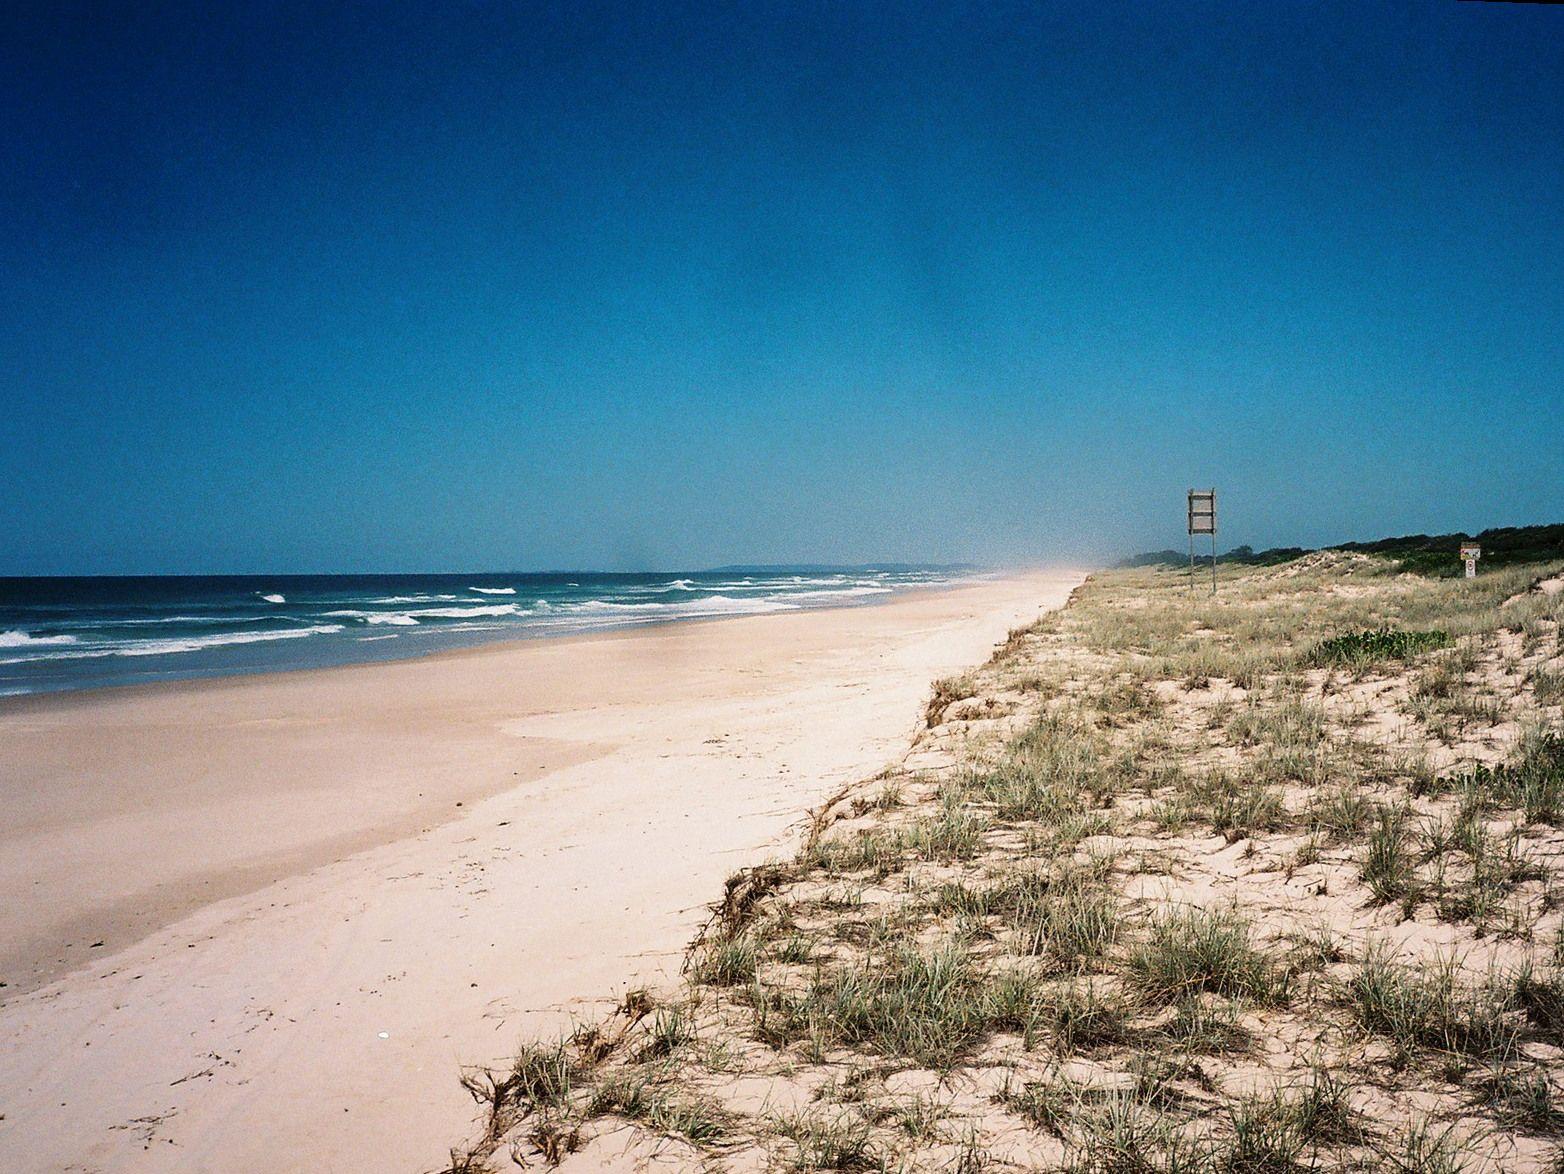 perus northern beaches died - HD1024×769